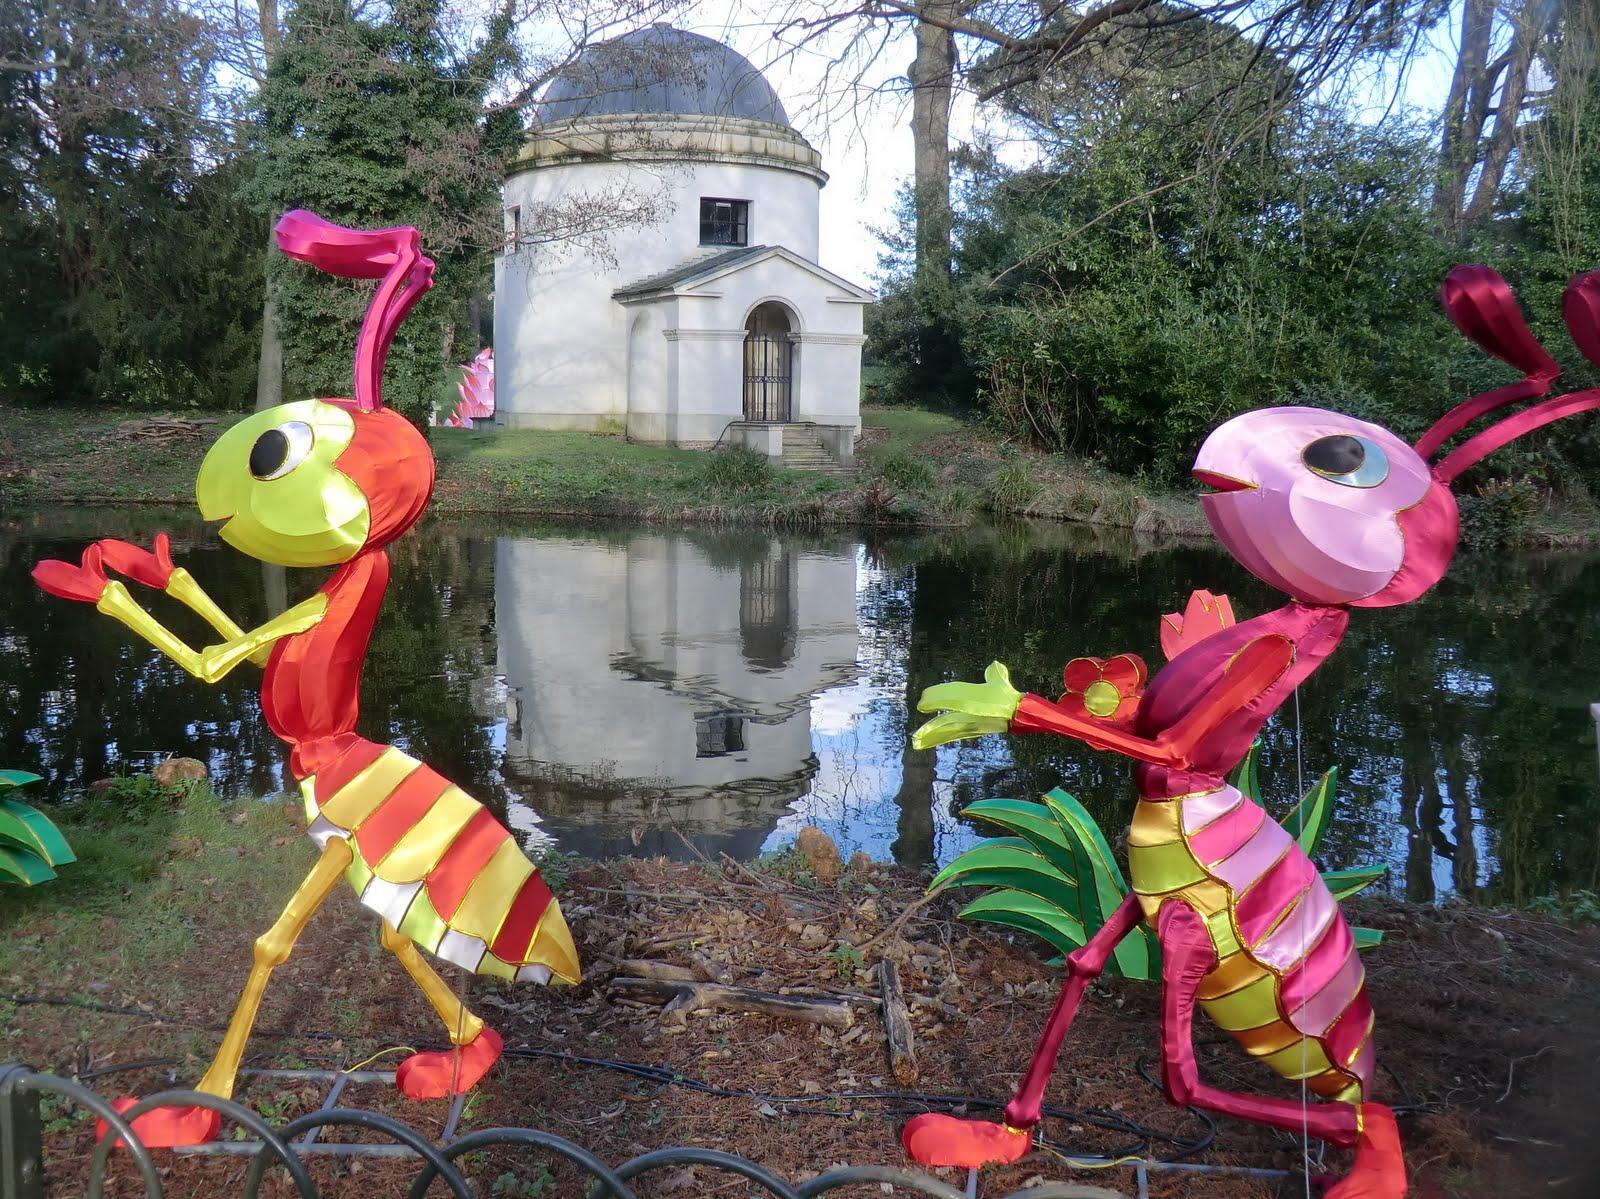 CIMG2533 Magical Lantern Festival 2016, Chiswick House